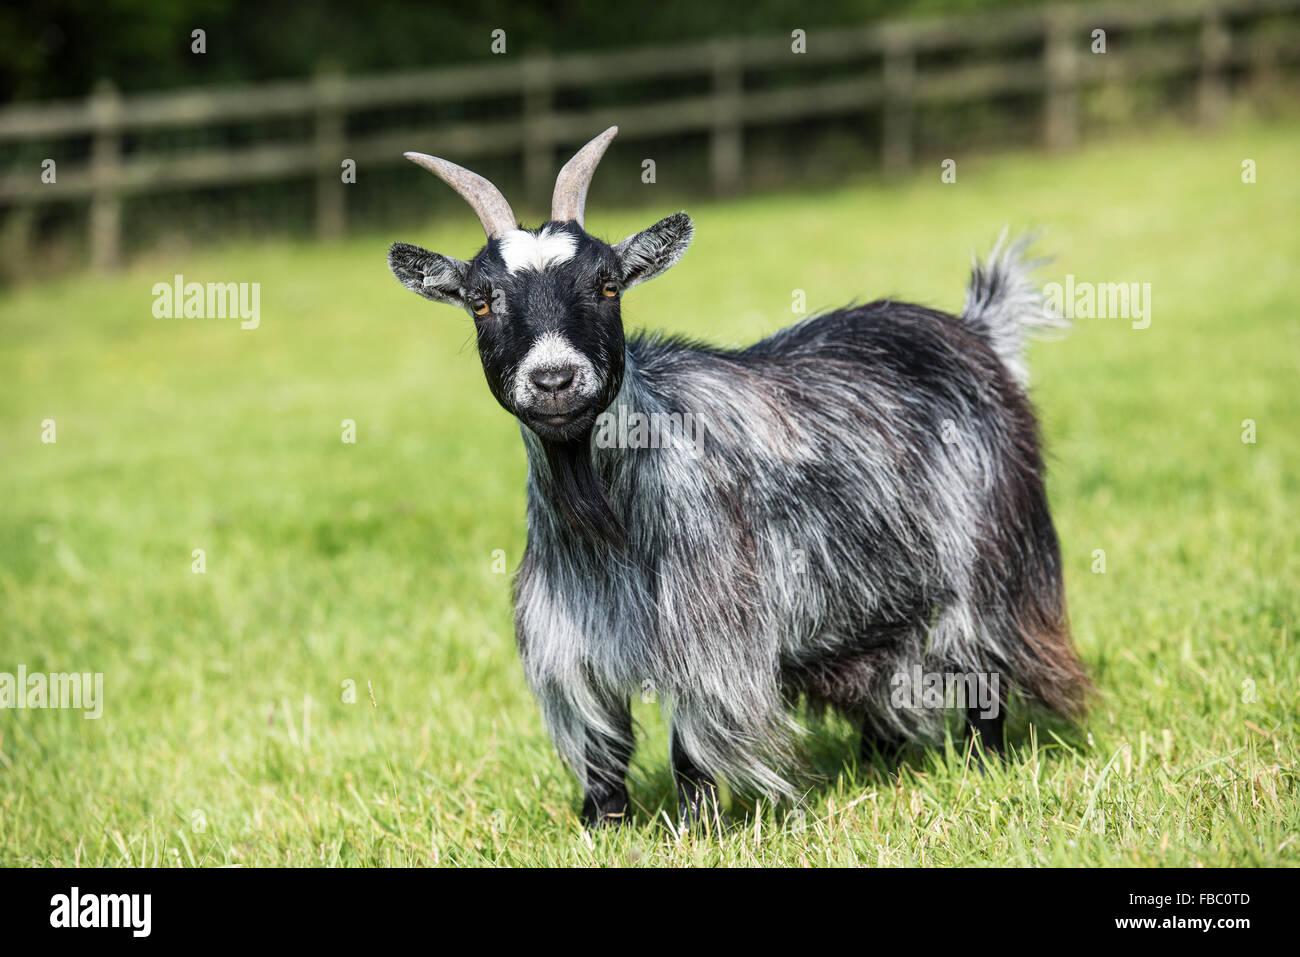 Long coated female pygmy goat with horns. - Stock Image